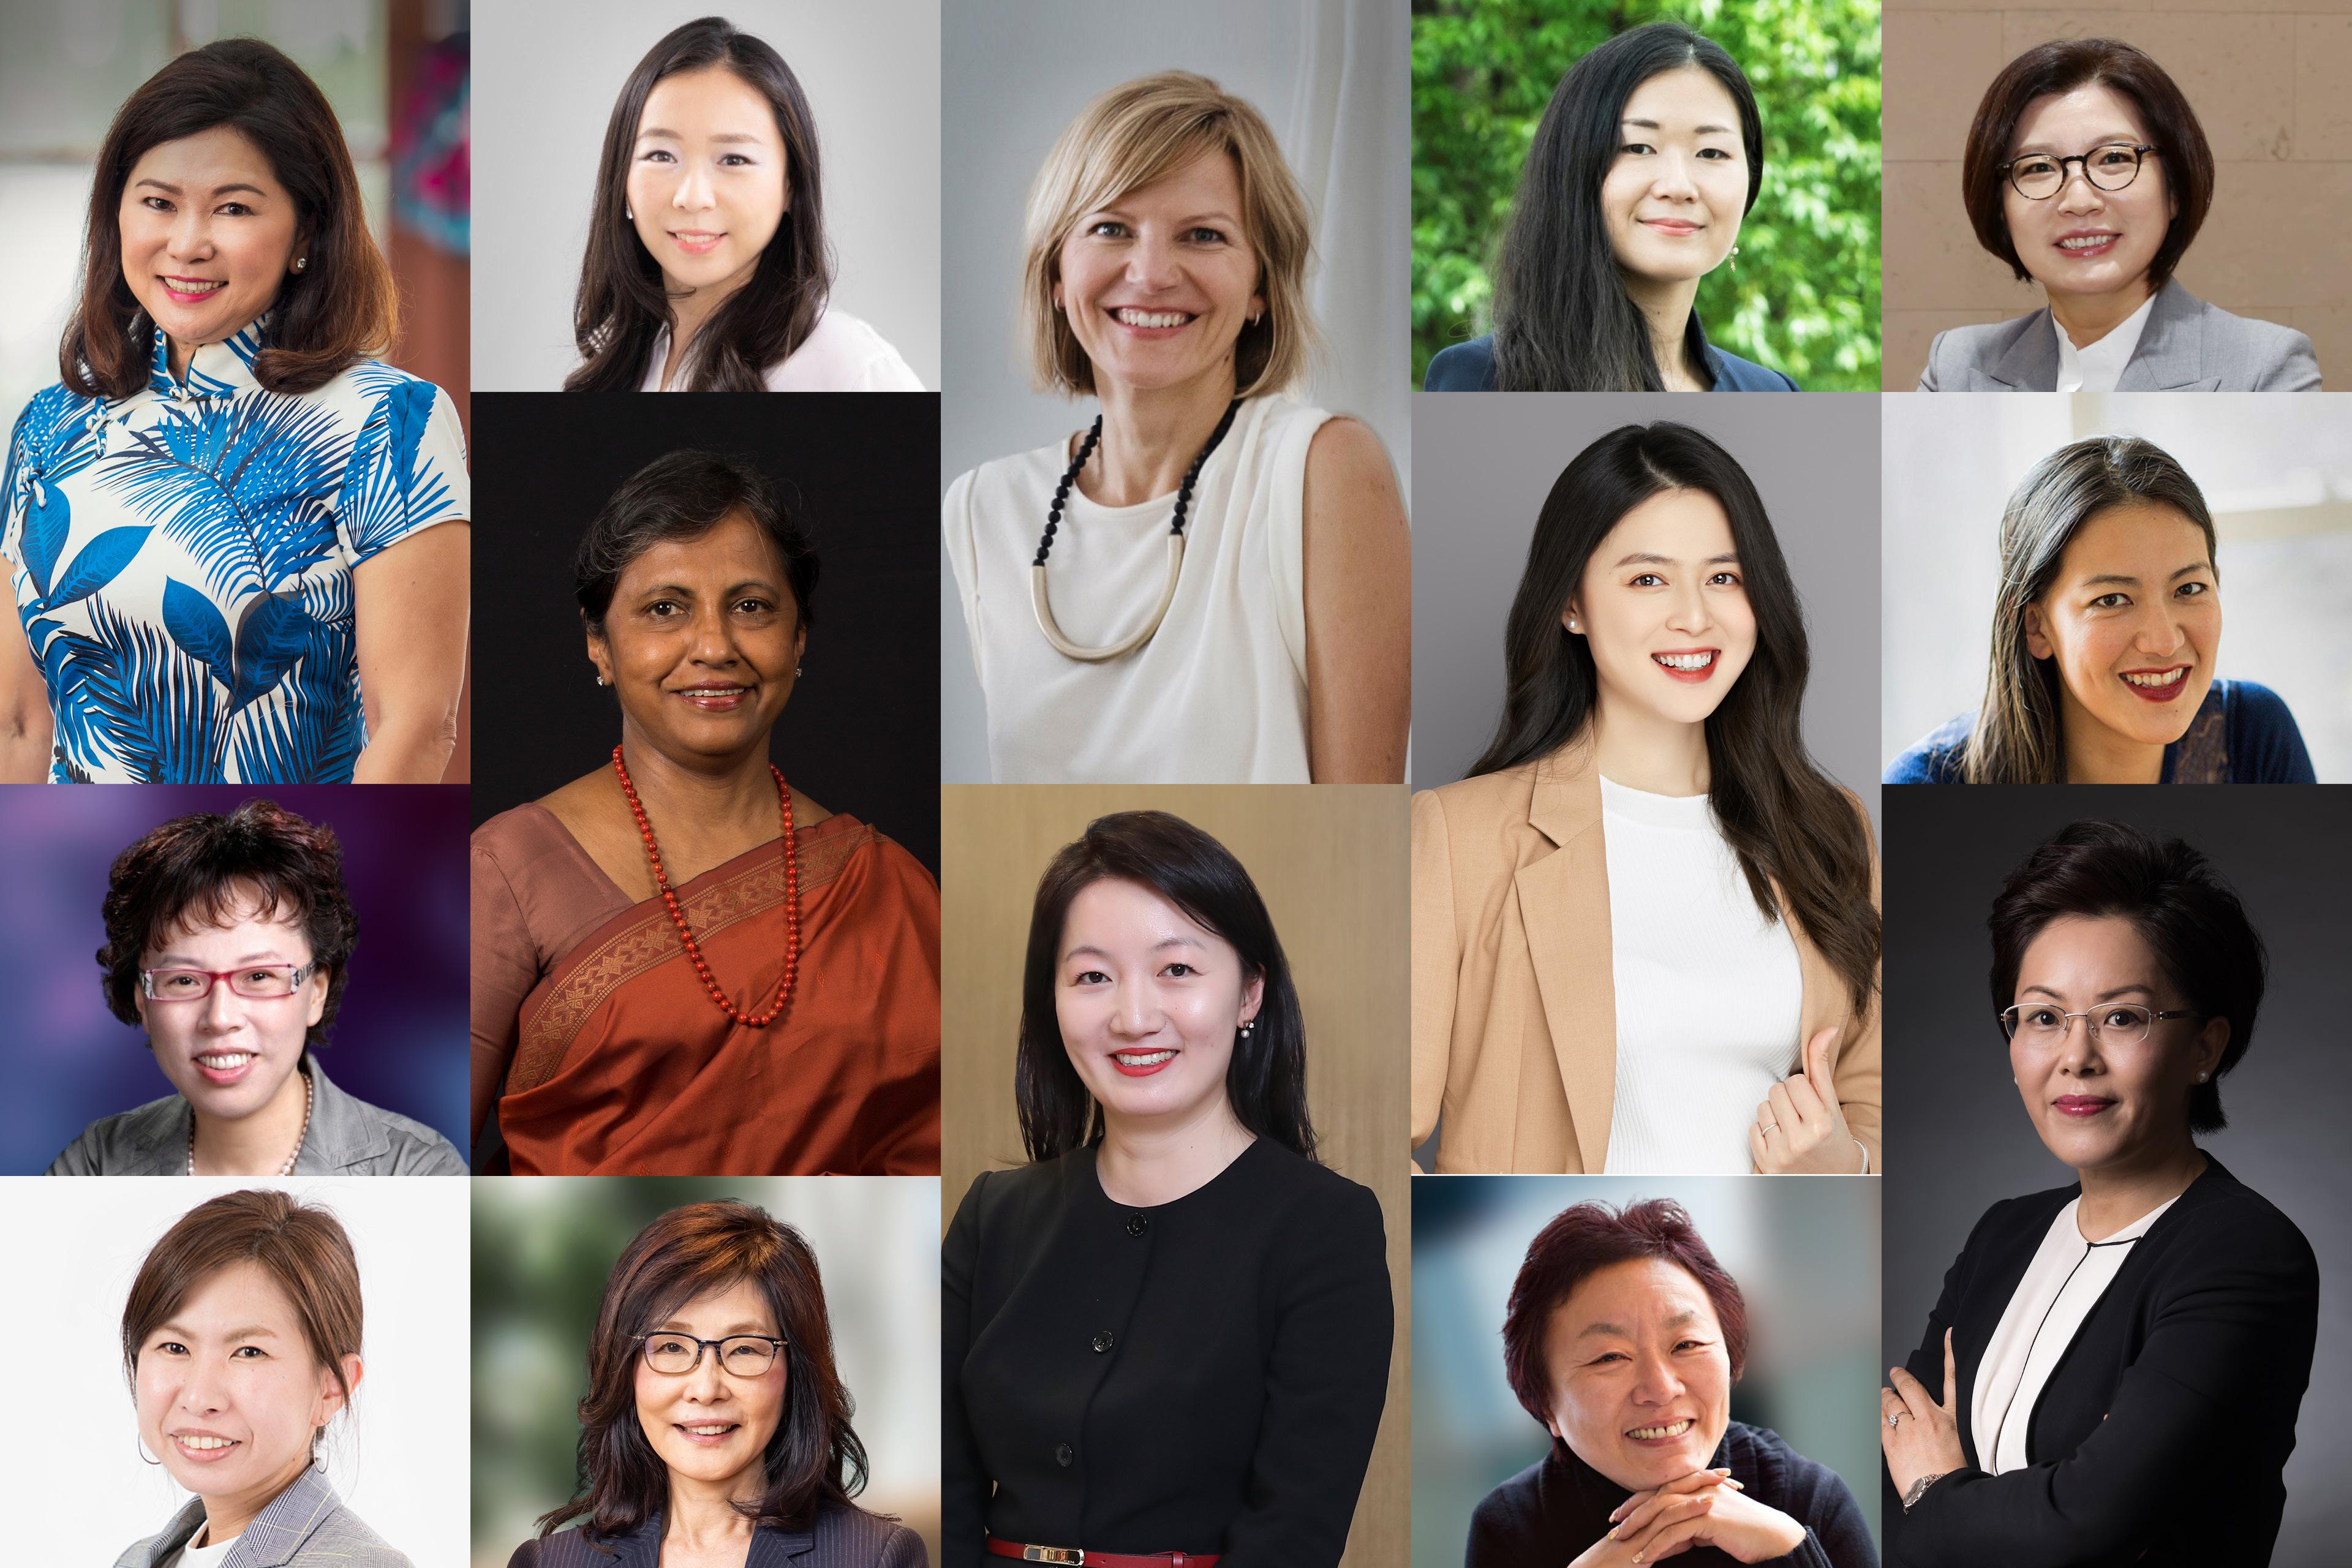 Entrepreneurial winning women group photograph